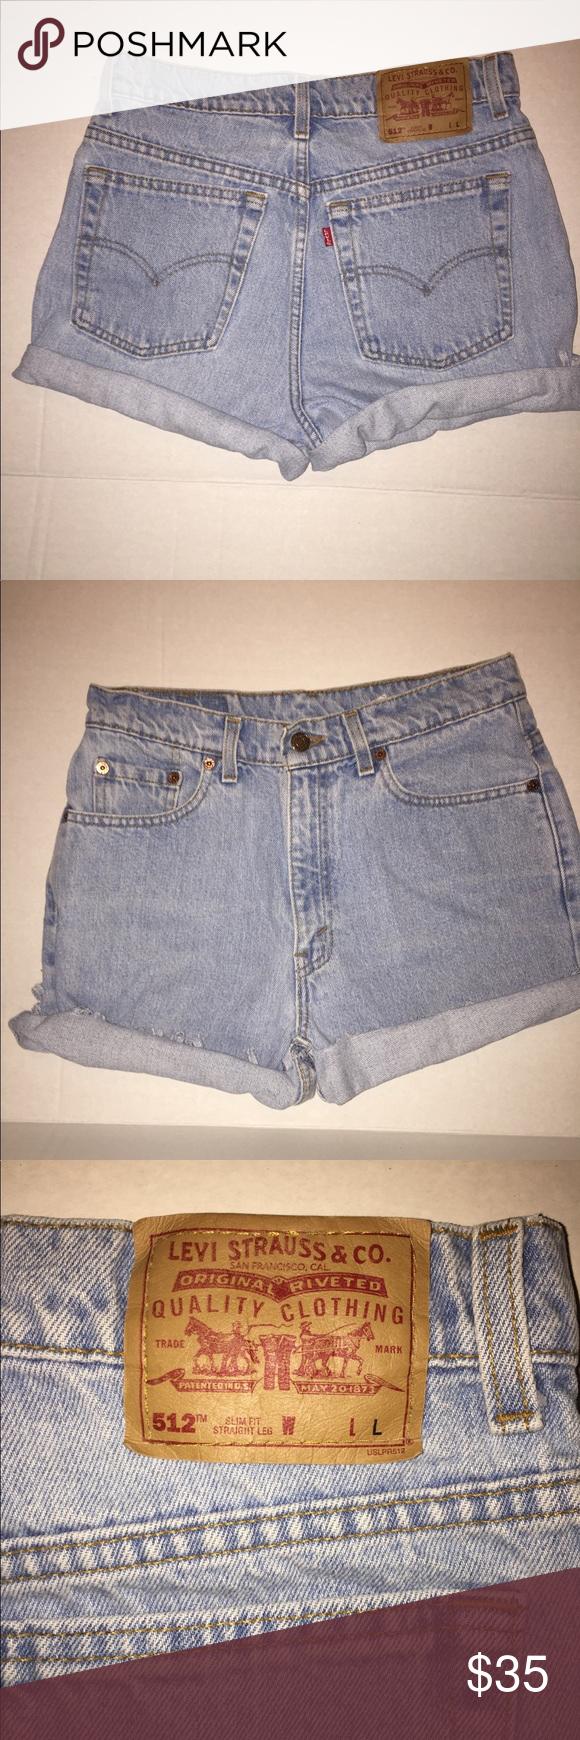 64744ad2d3 Vintage Levi's 512 Cut Off High Waist Shorts